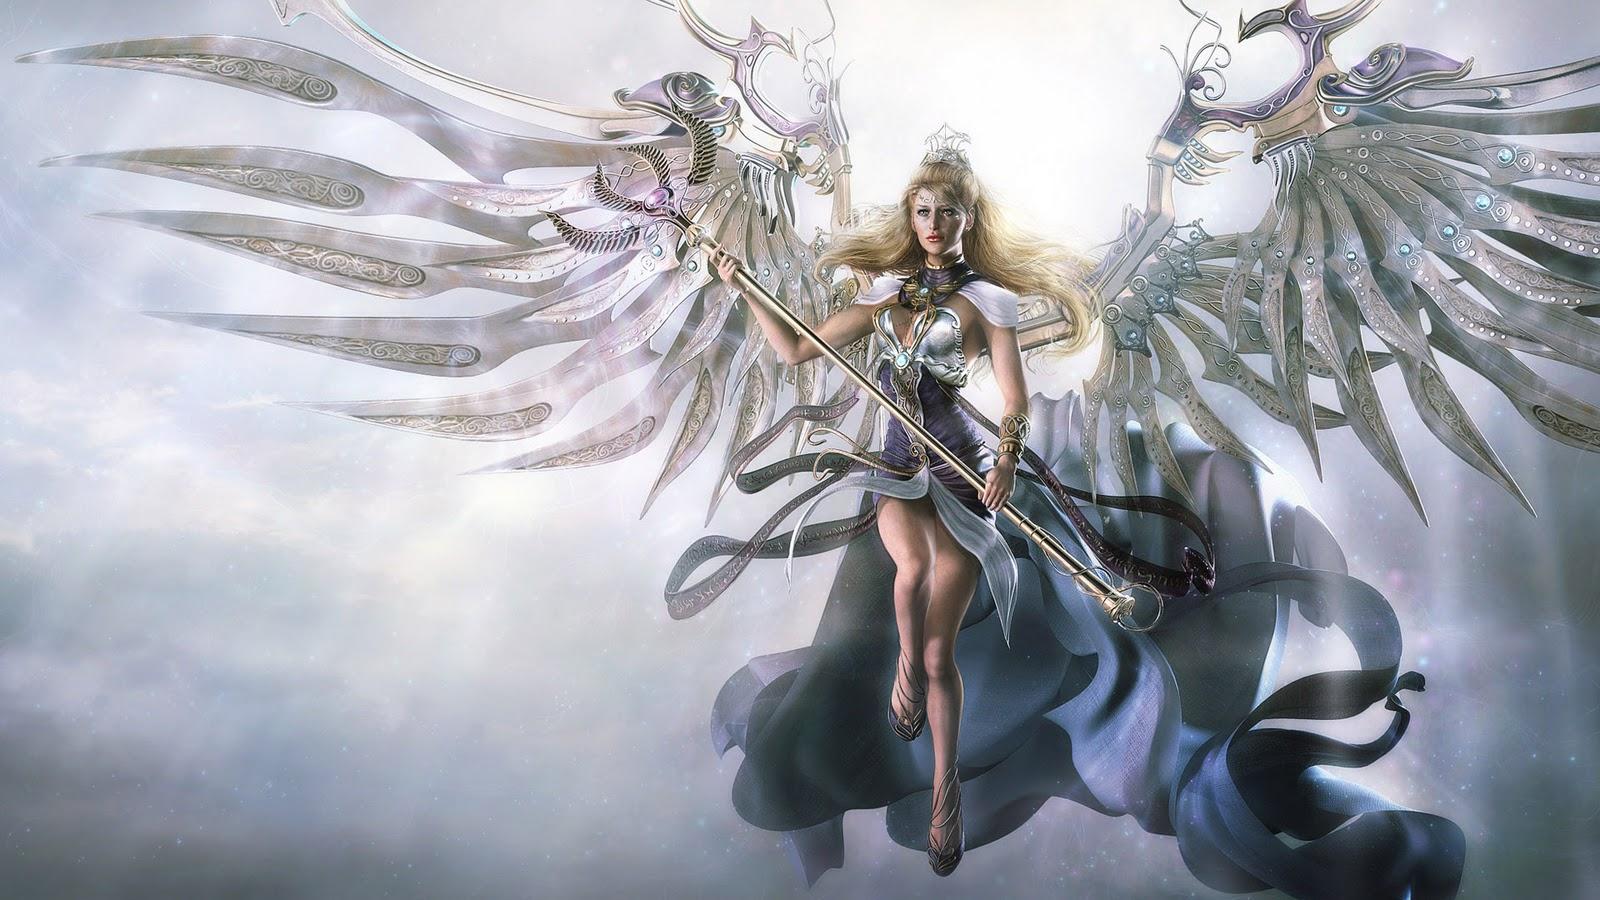 http://4.bp.blogspot.com/-OfWVjT6_7eY/TwlLgNI647I/AAAAAAAAA6s/bzt0gYunDkg/s1600/Angel+Fantasy+Wallpapers+HD+4.jpg